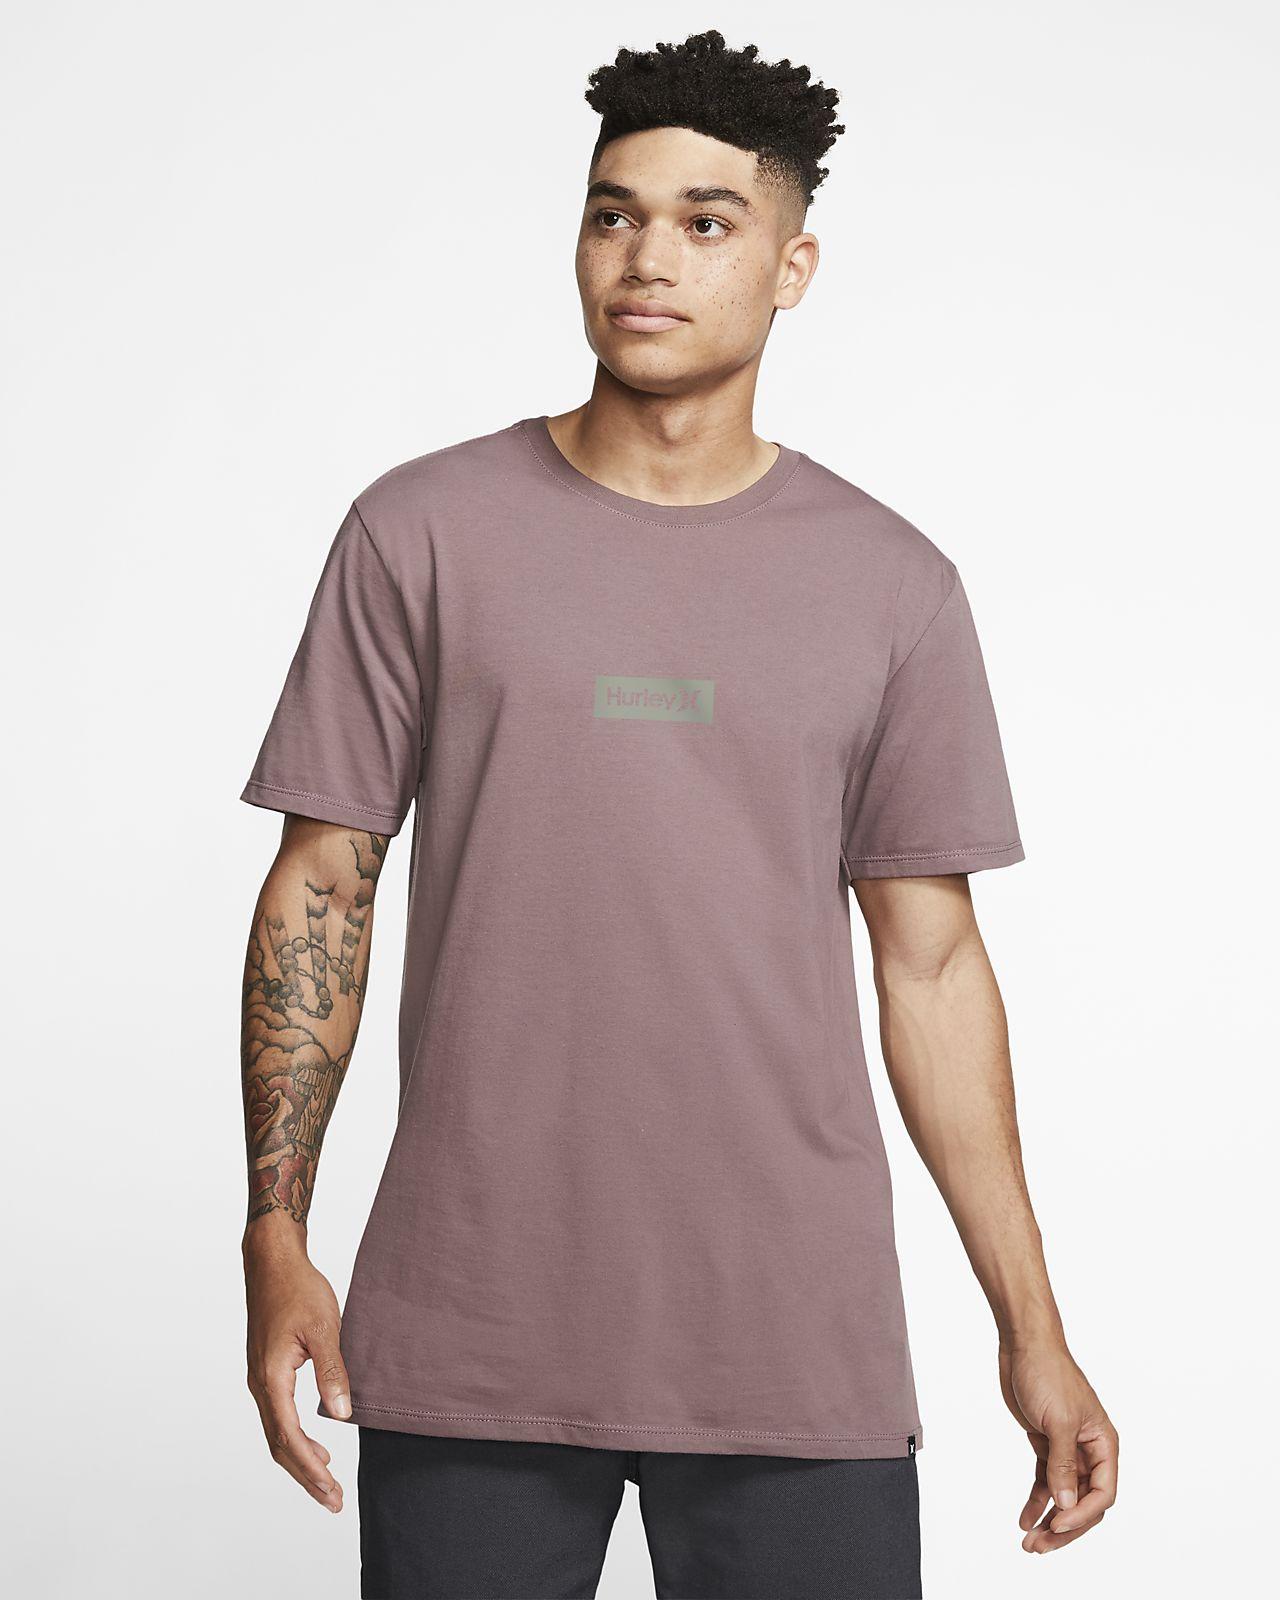 Hurley Premium One And Only Small Box Kaliteli Kesim Erkek Tişörtü